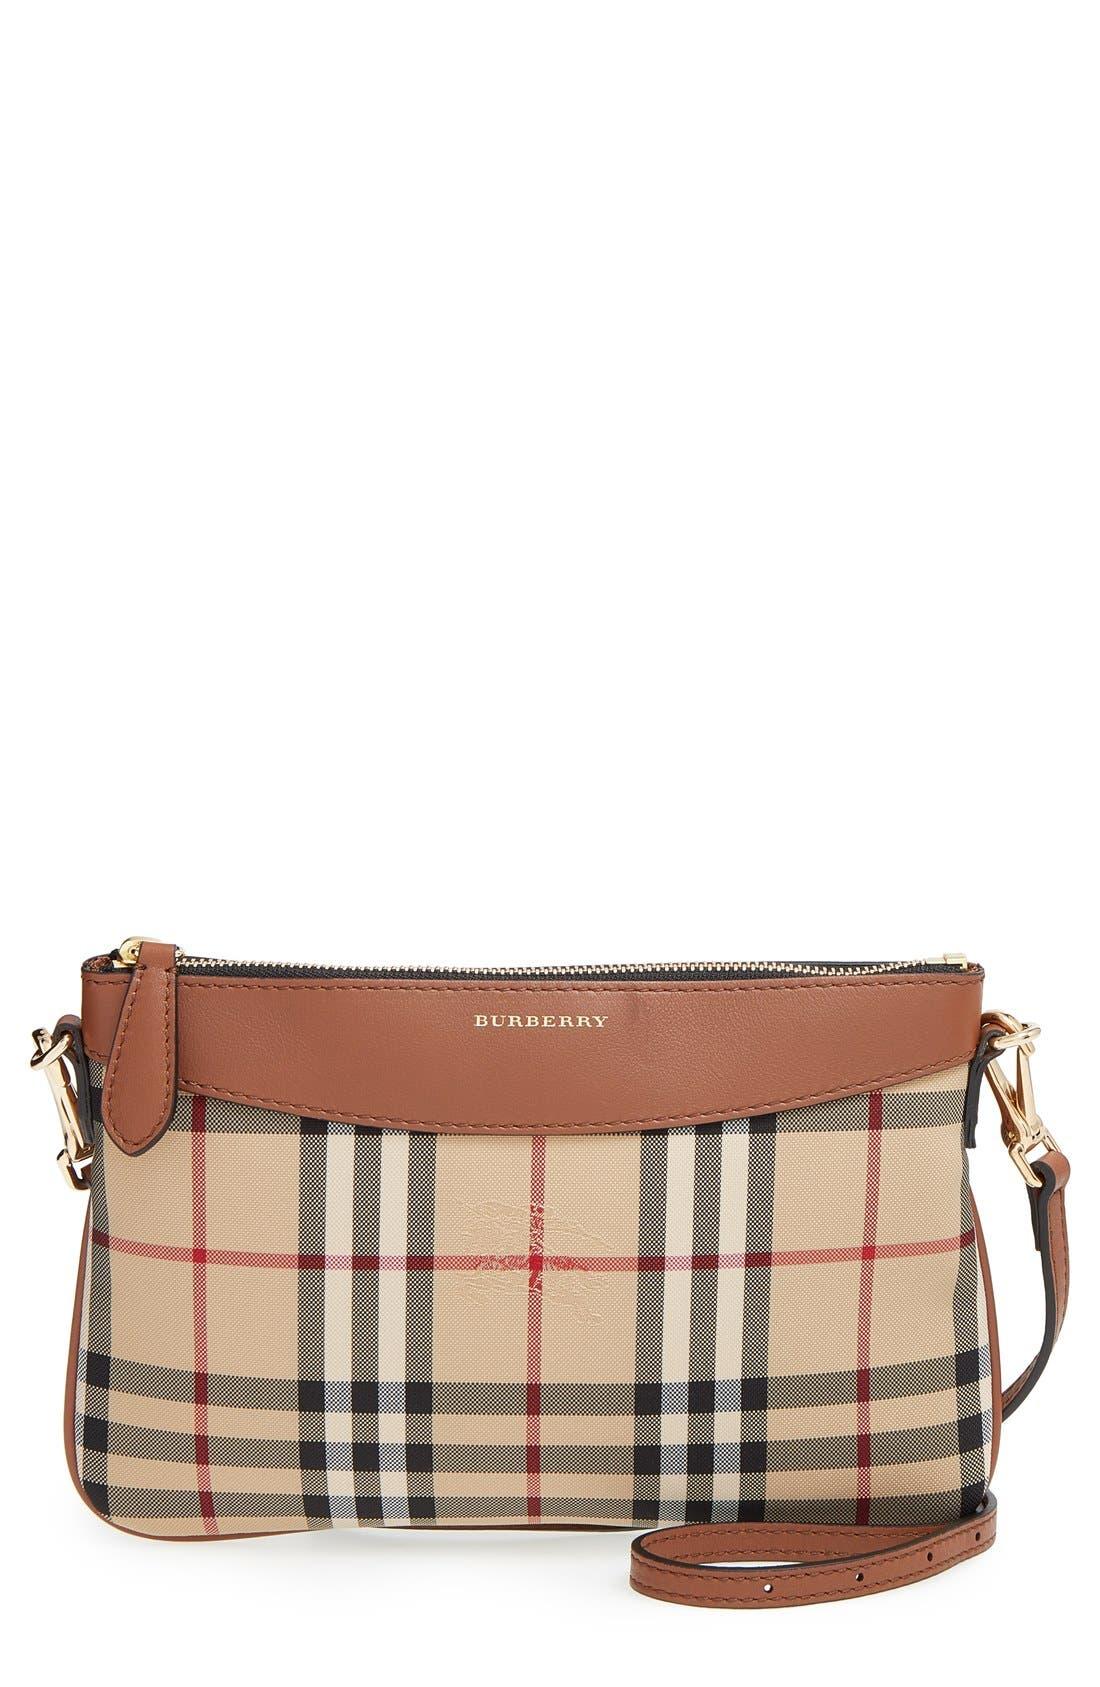 Burberry 'Peyton - Horseferry Check' Crossbody Bag